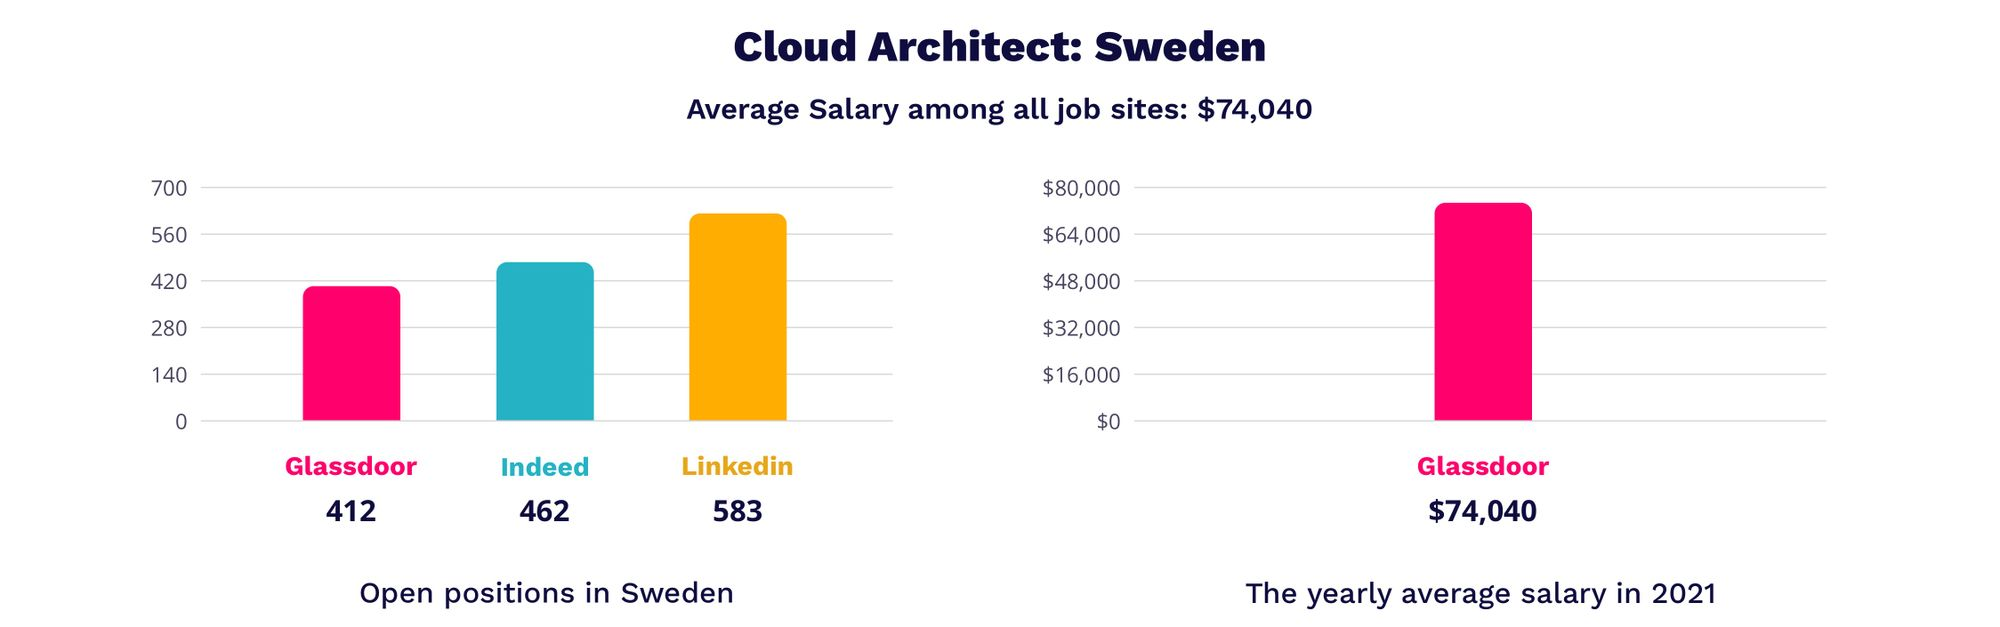 cloud architect salaries in Sweden